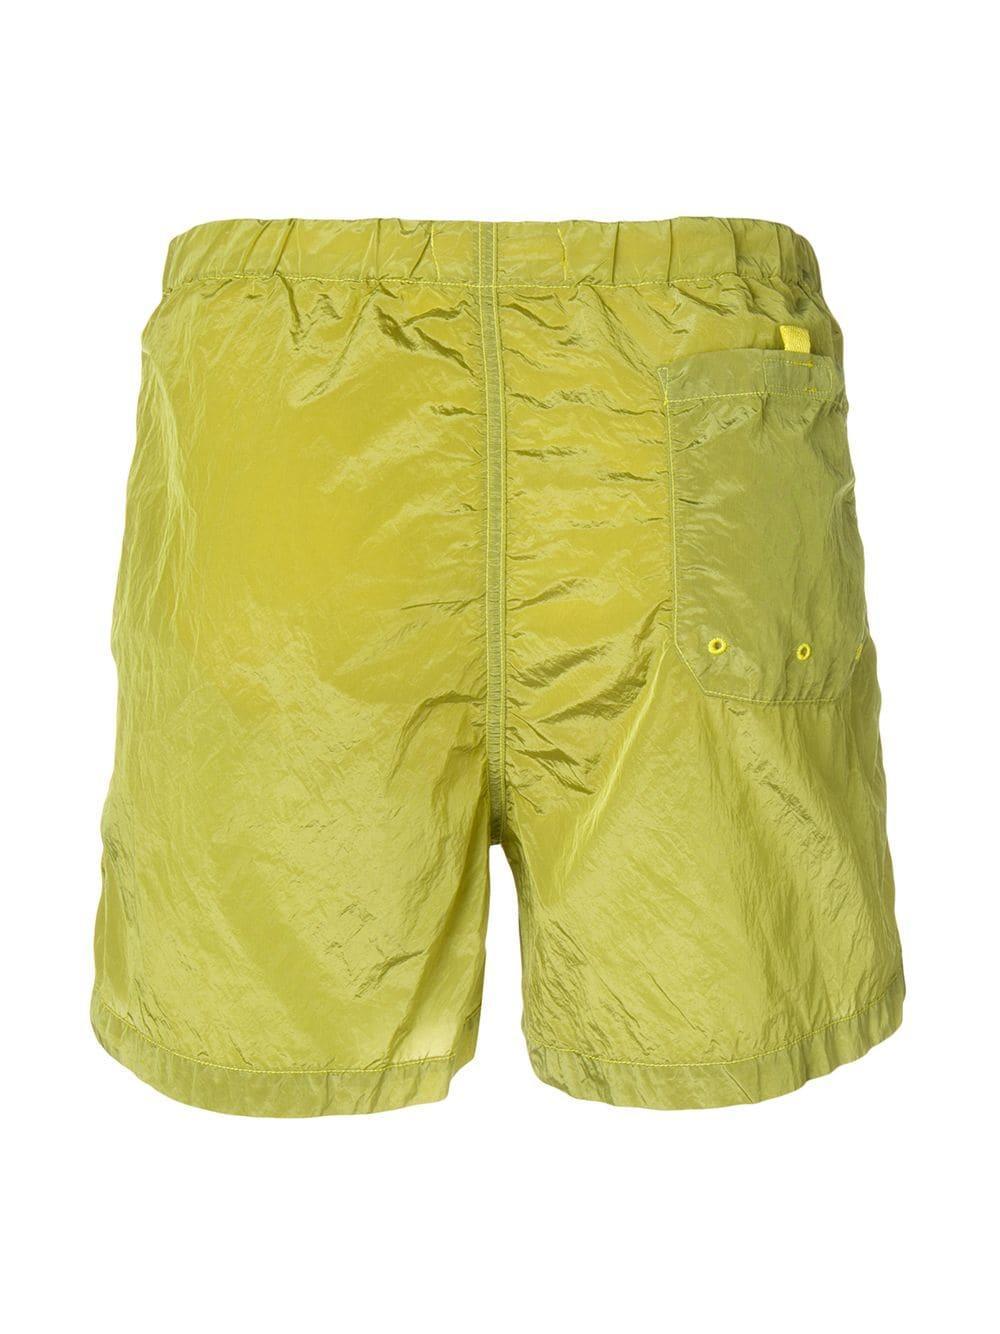 73751b8c4c8f6 Stone Island Drawstring Waist Swimming Shorts in Green for Men - Lyst